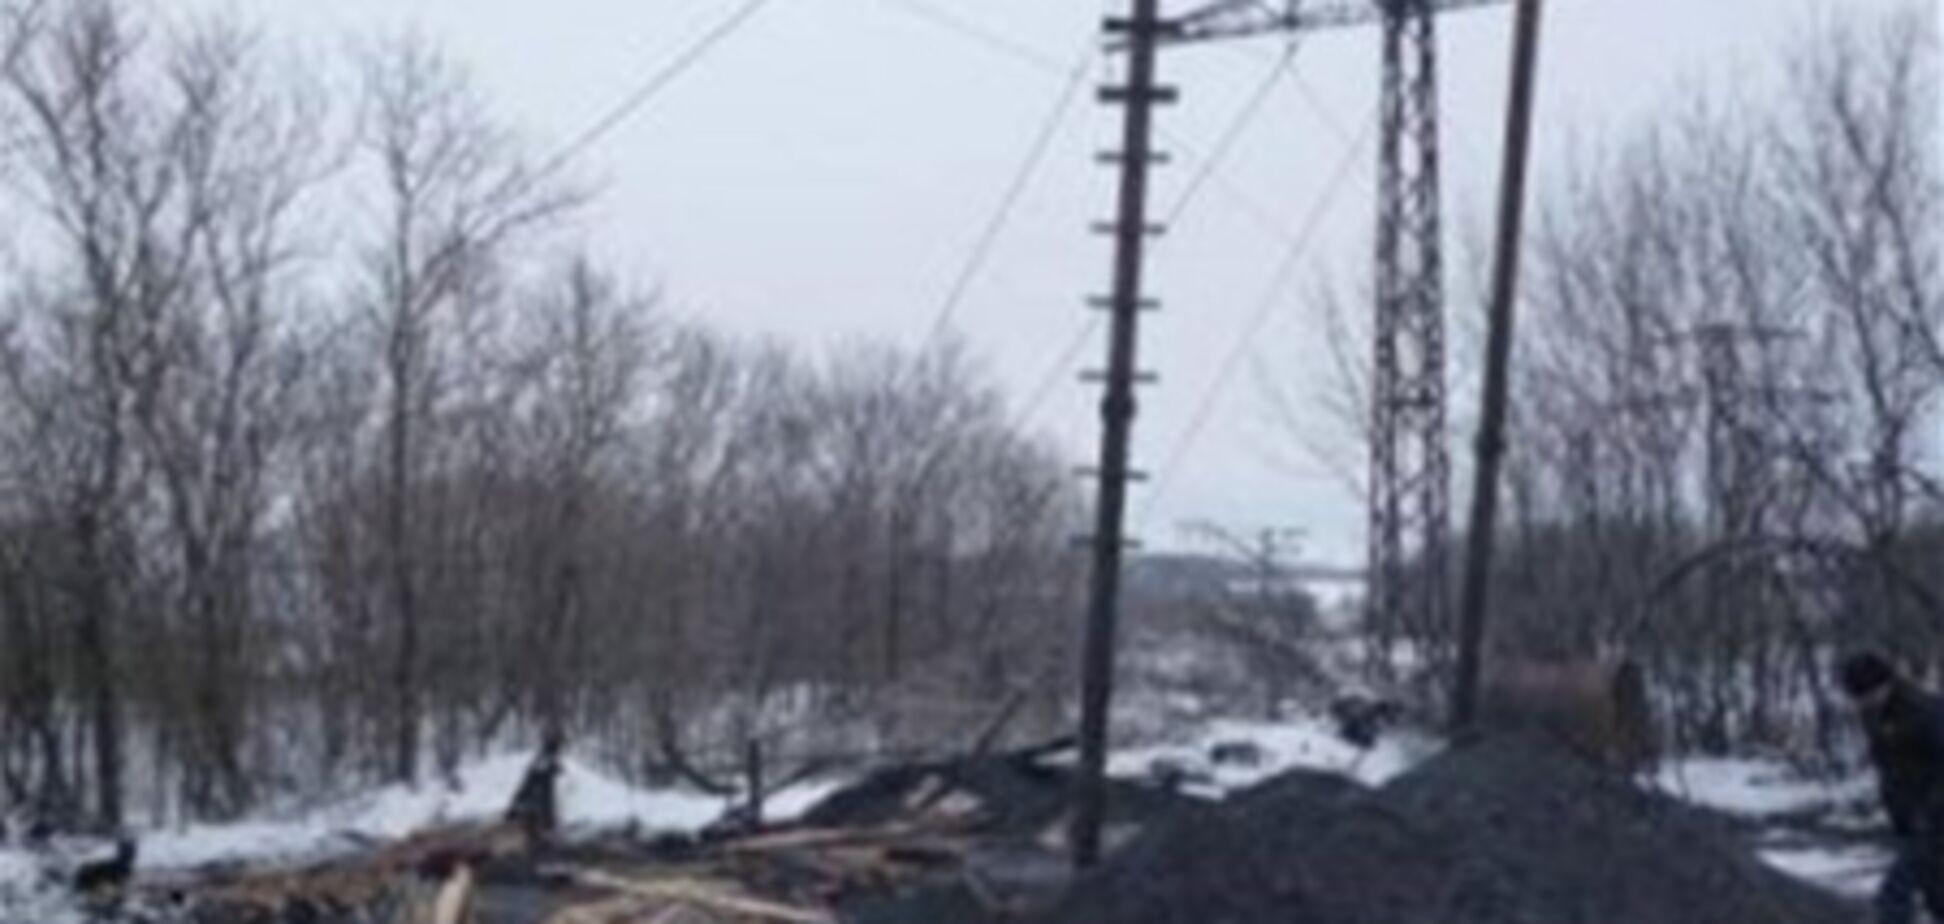 На Донетчине взорвалась нелегальная шахта: 6 горняков пропали без вести